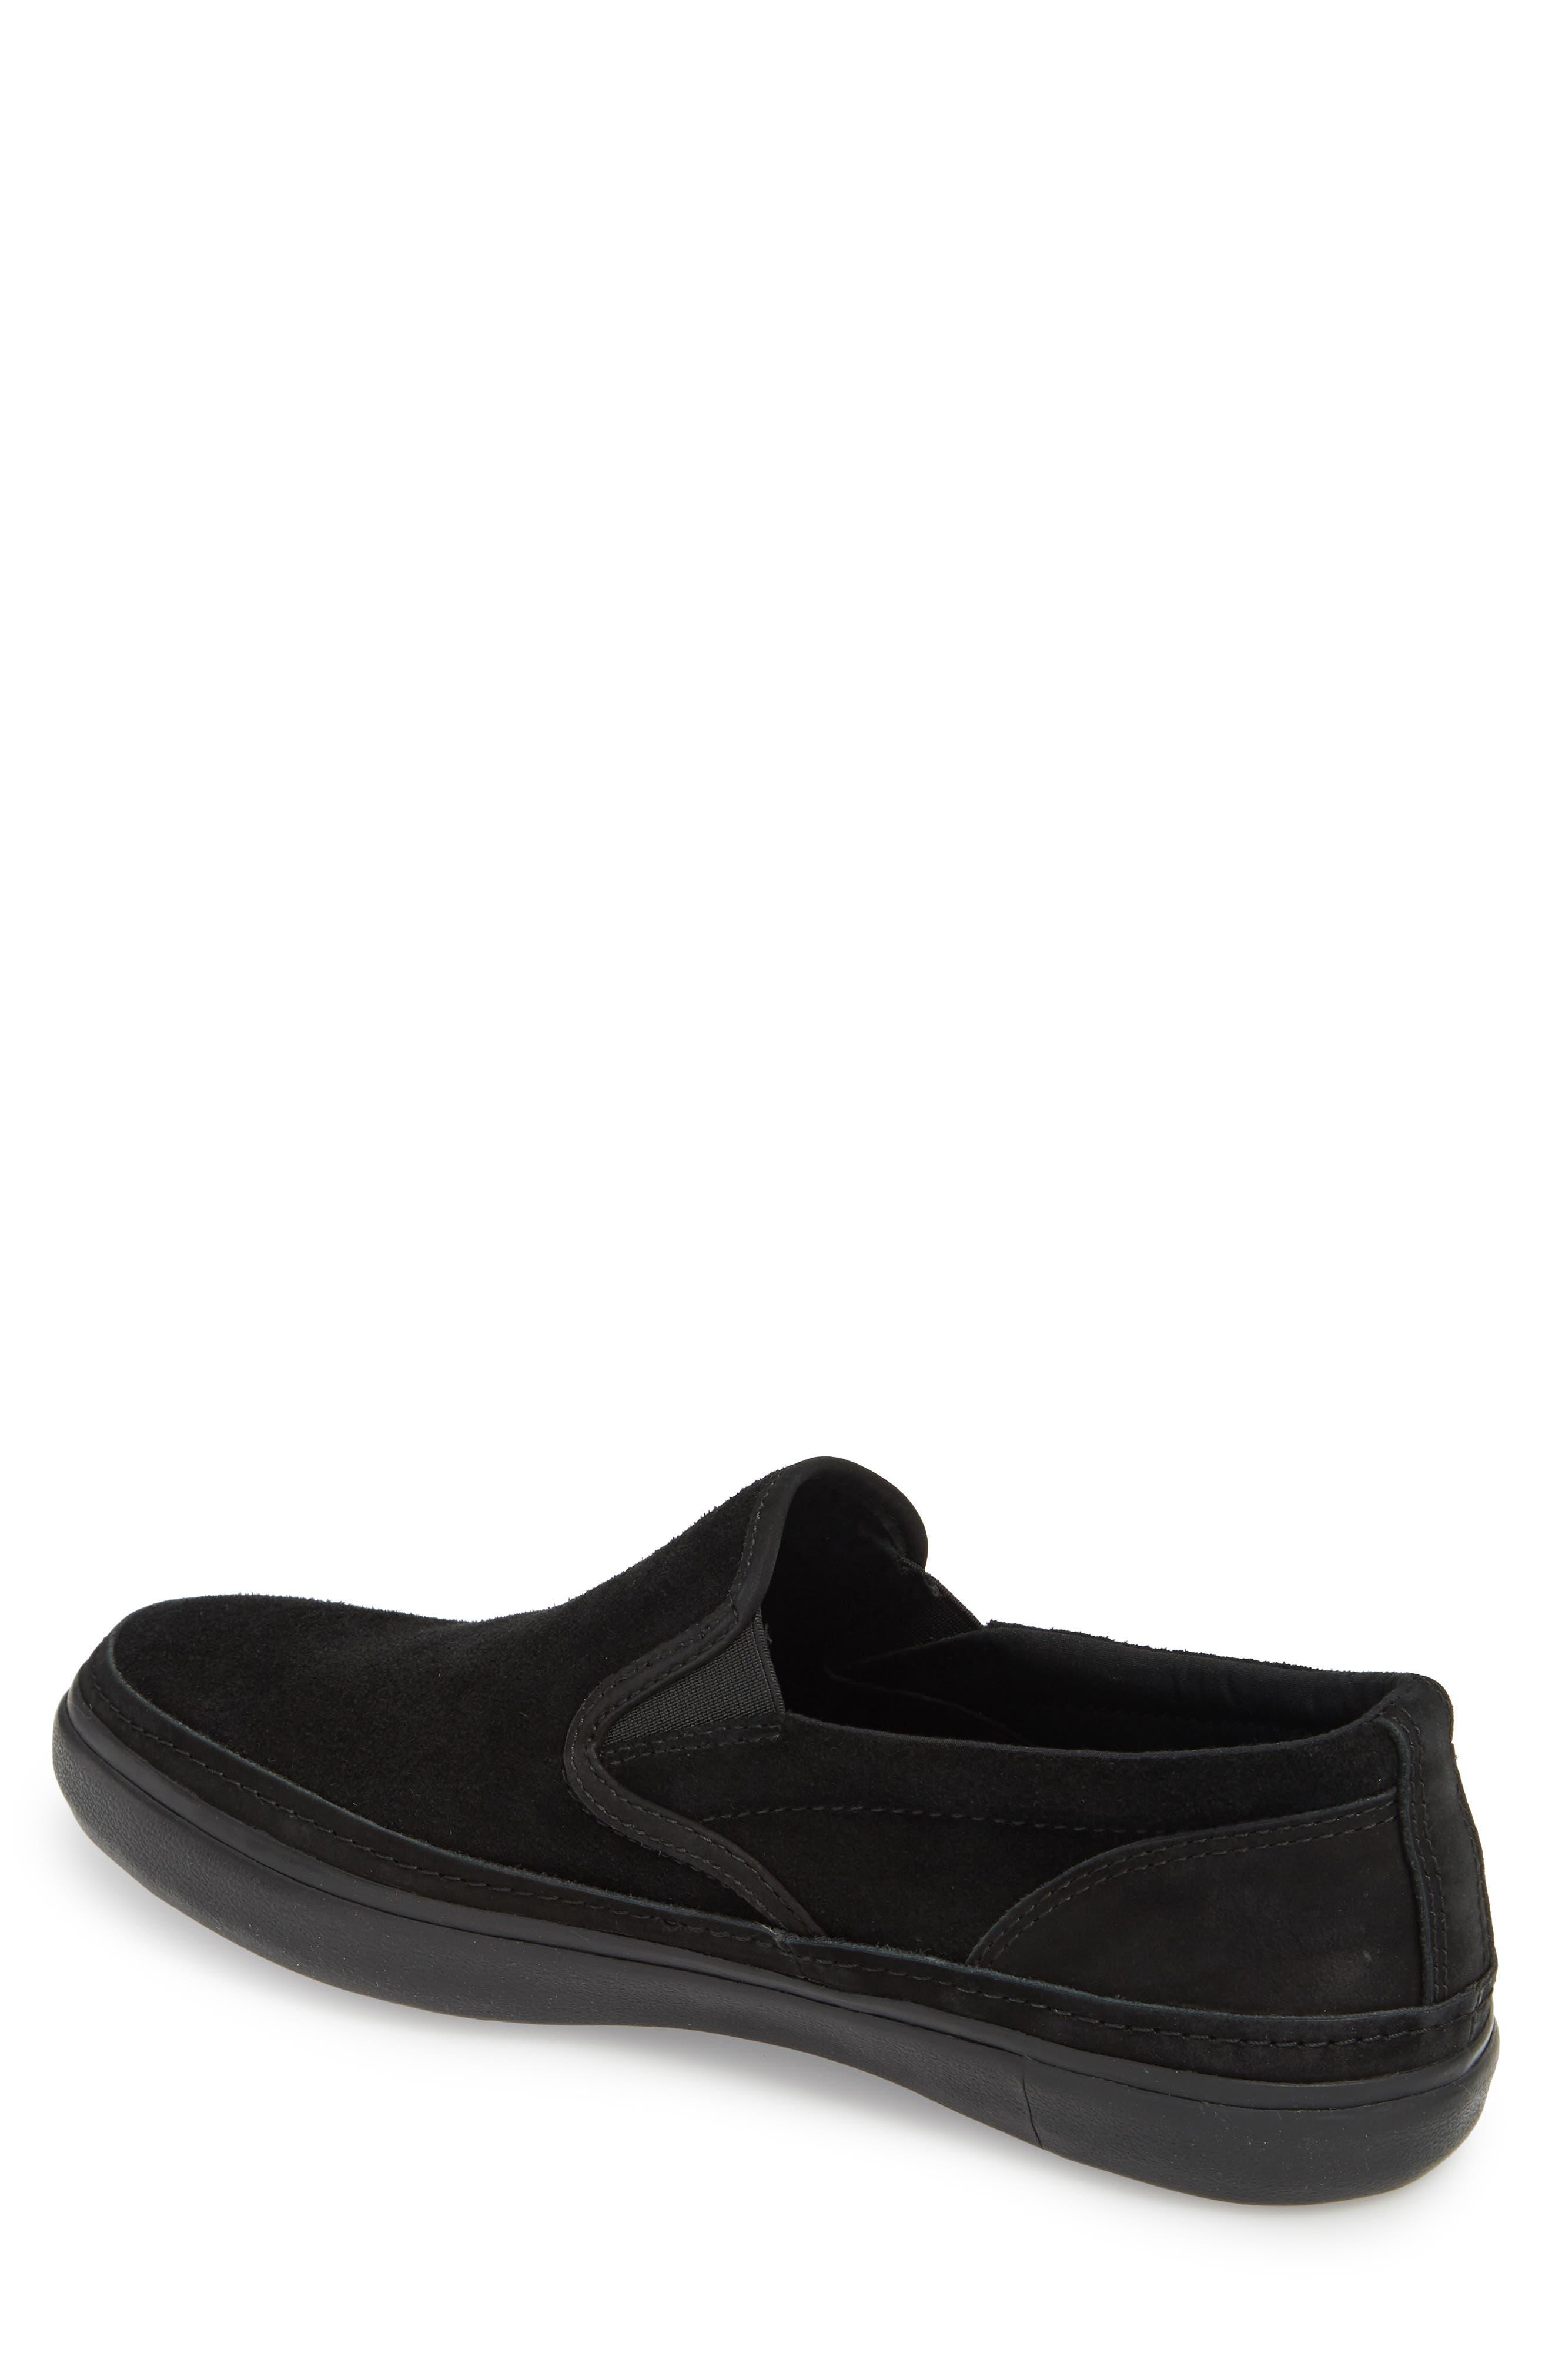 Suede Jet Slip-On Sneaker,                             Alternate thumbnail 2, color,                             BLACK SUEDE